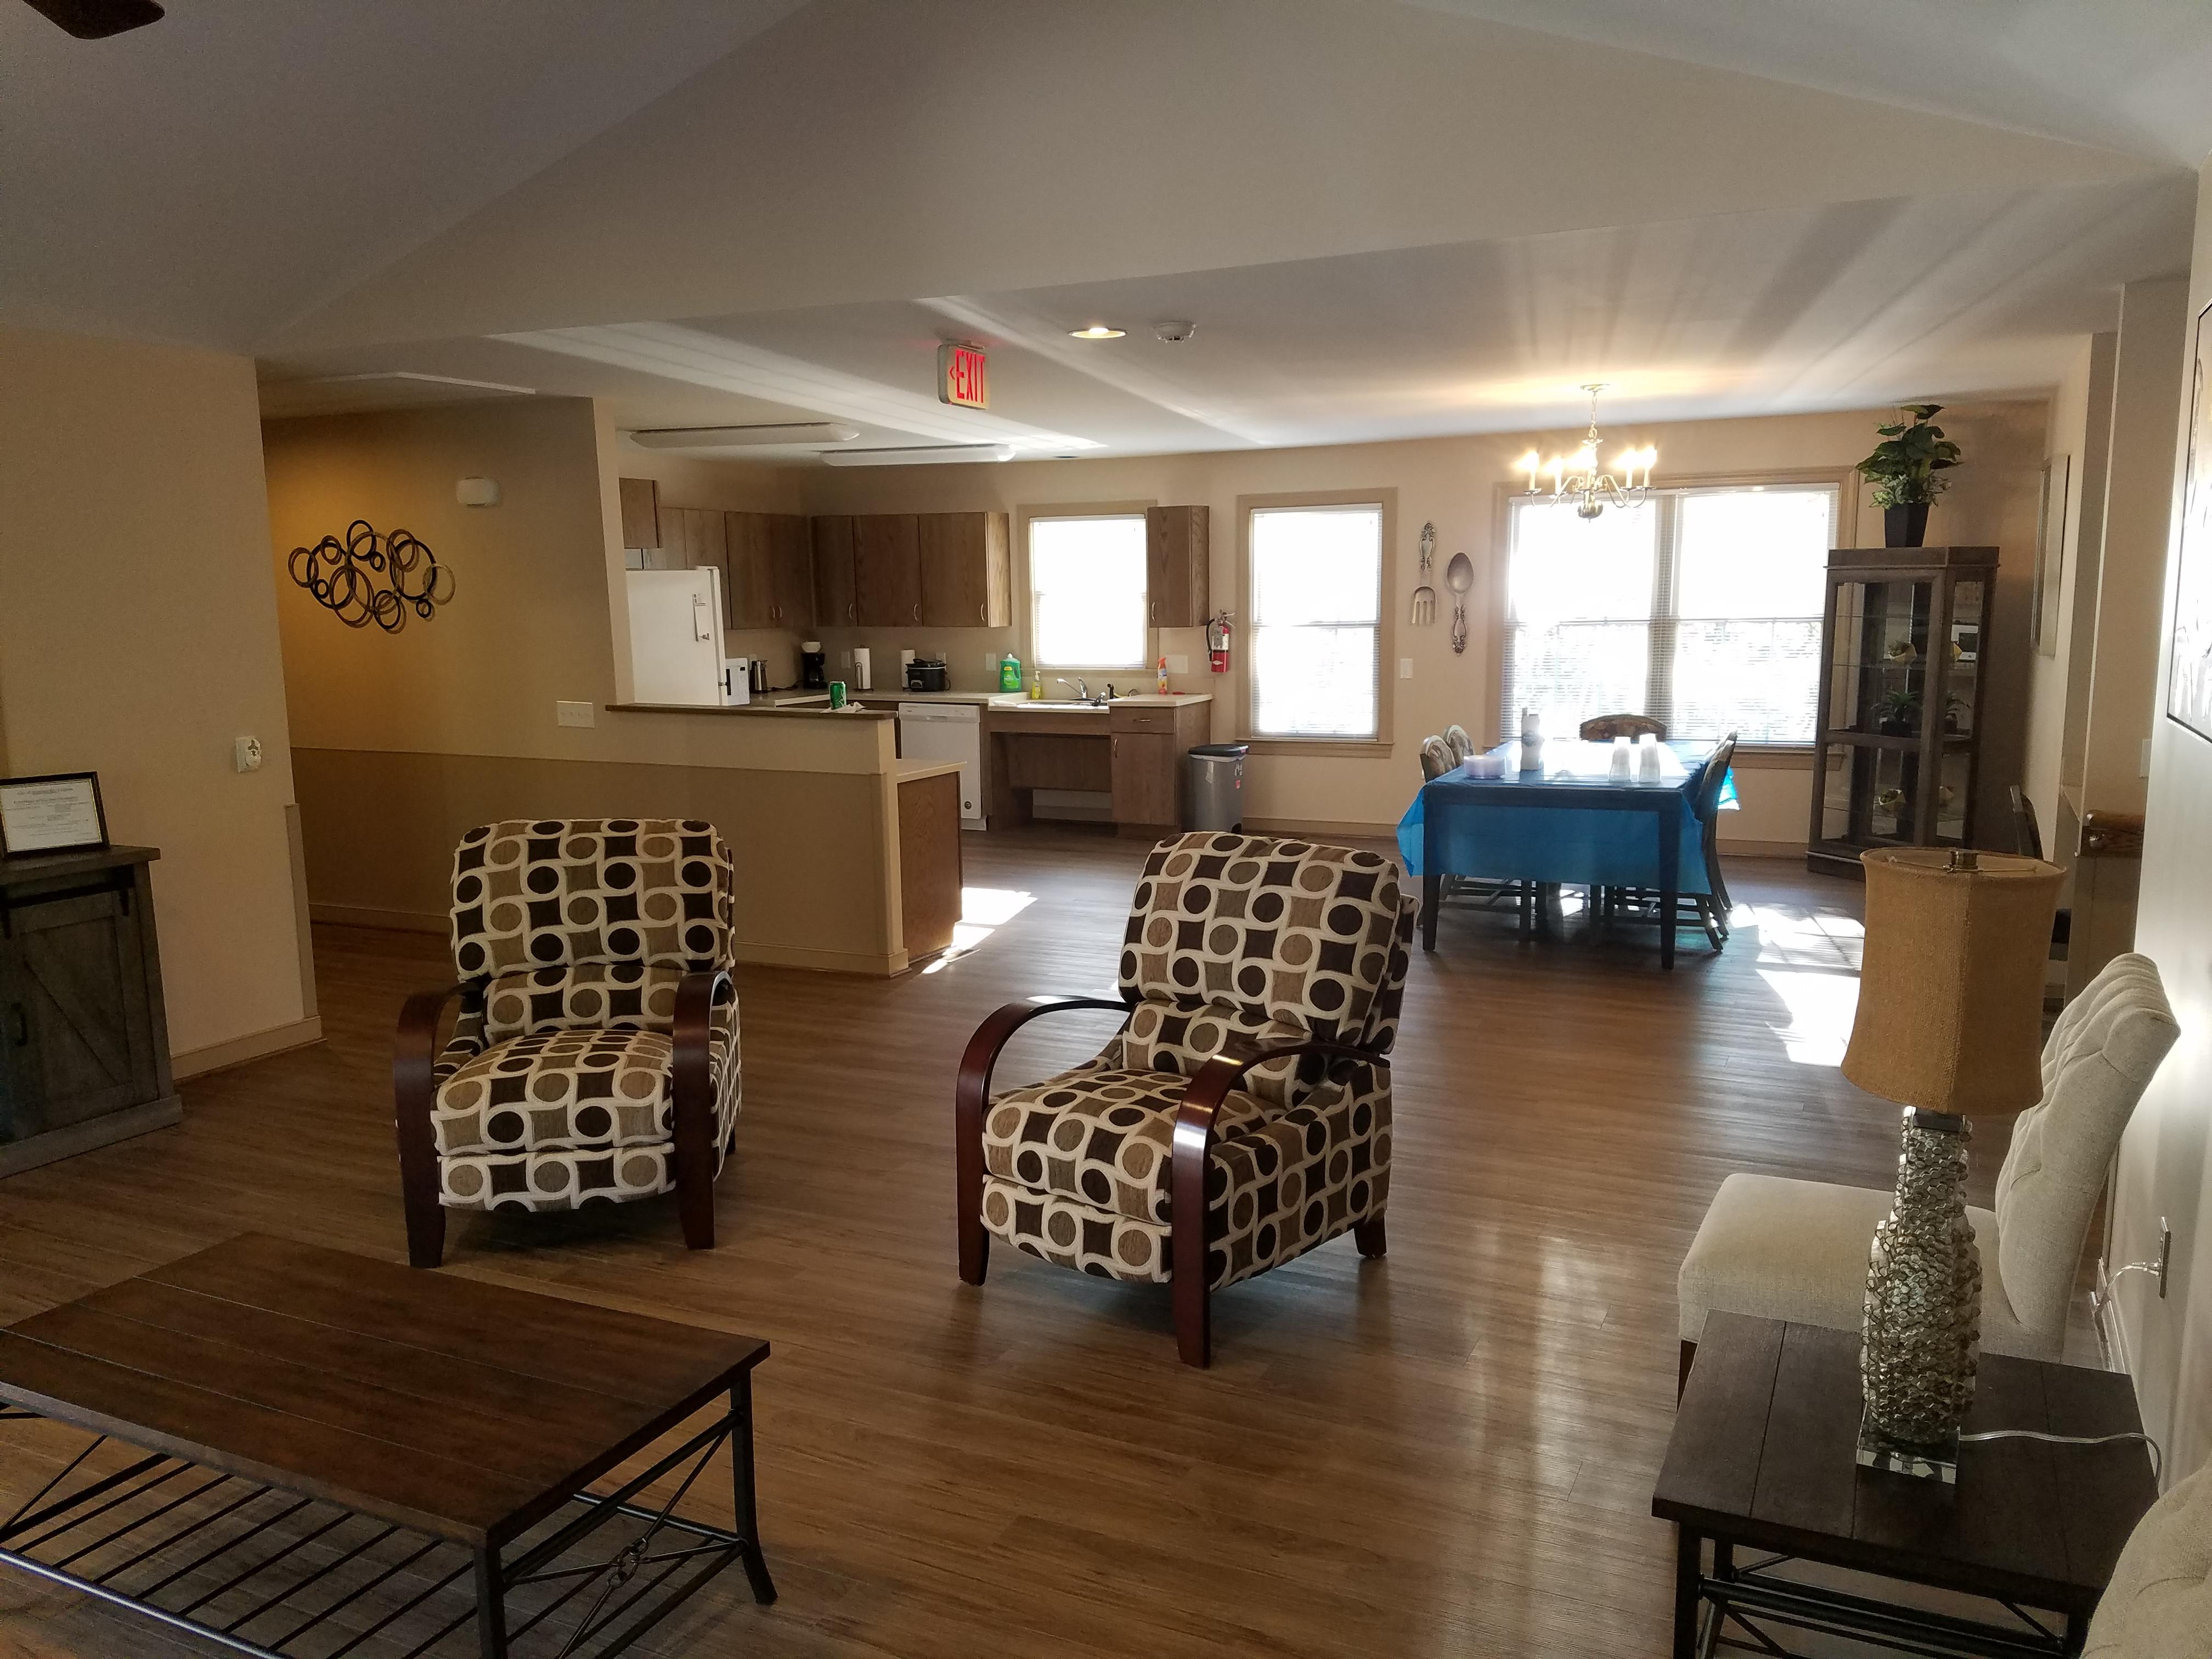 livingroom kitchen area